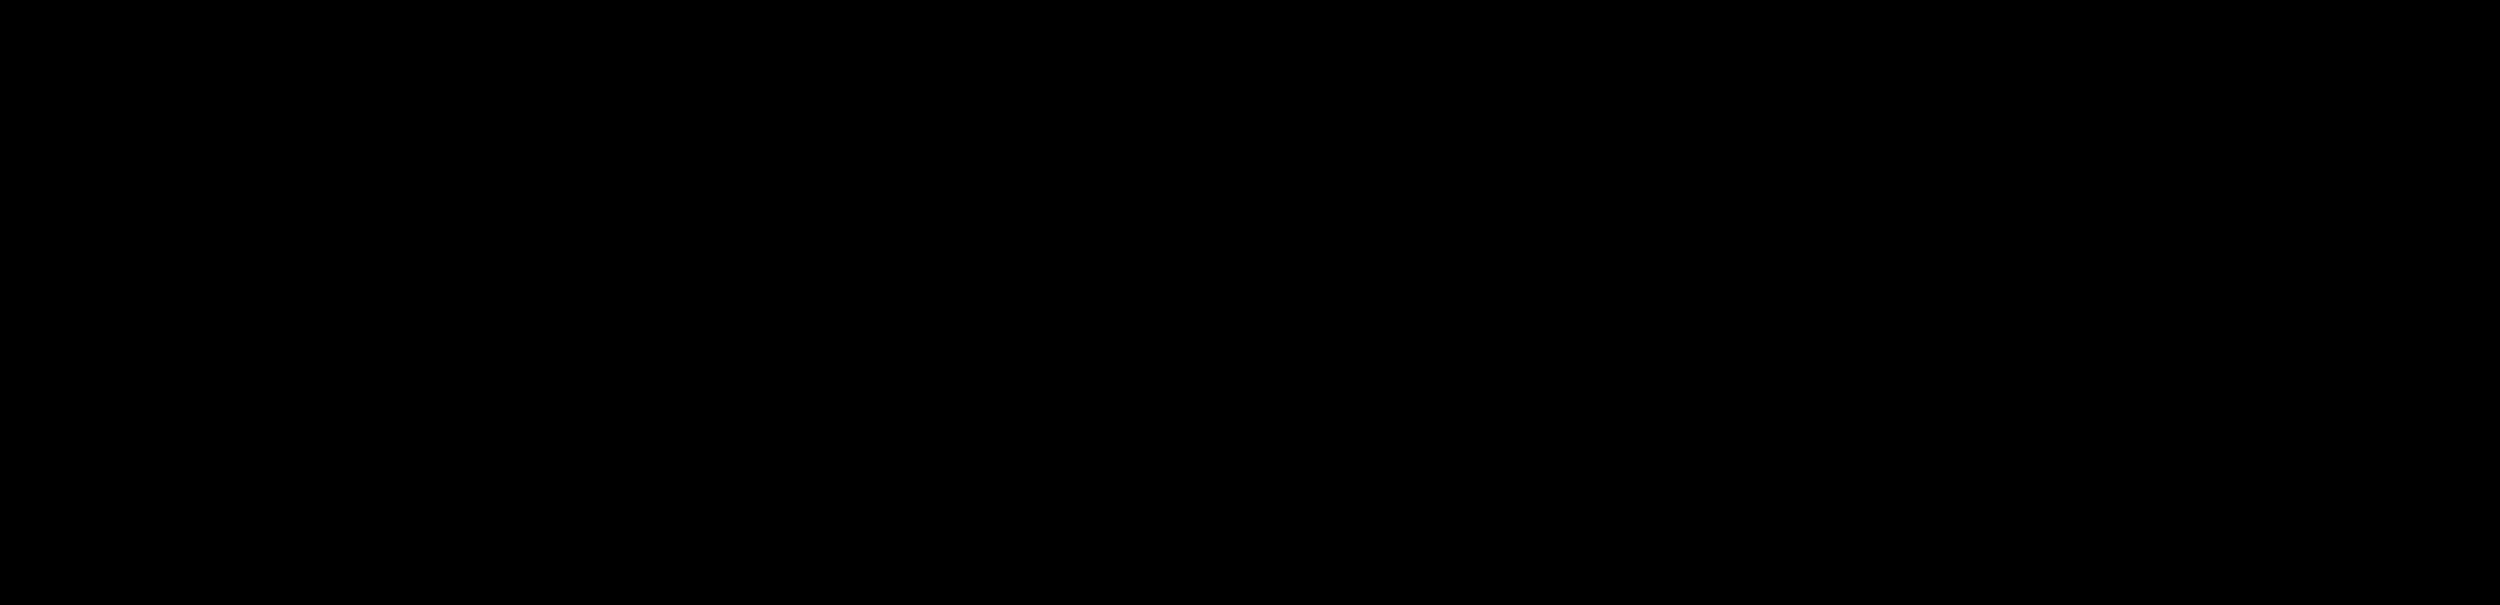 wwf-logo-with-tab@2x copy.png